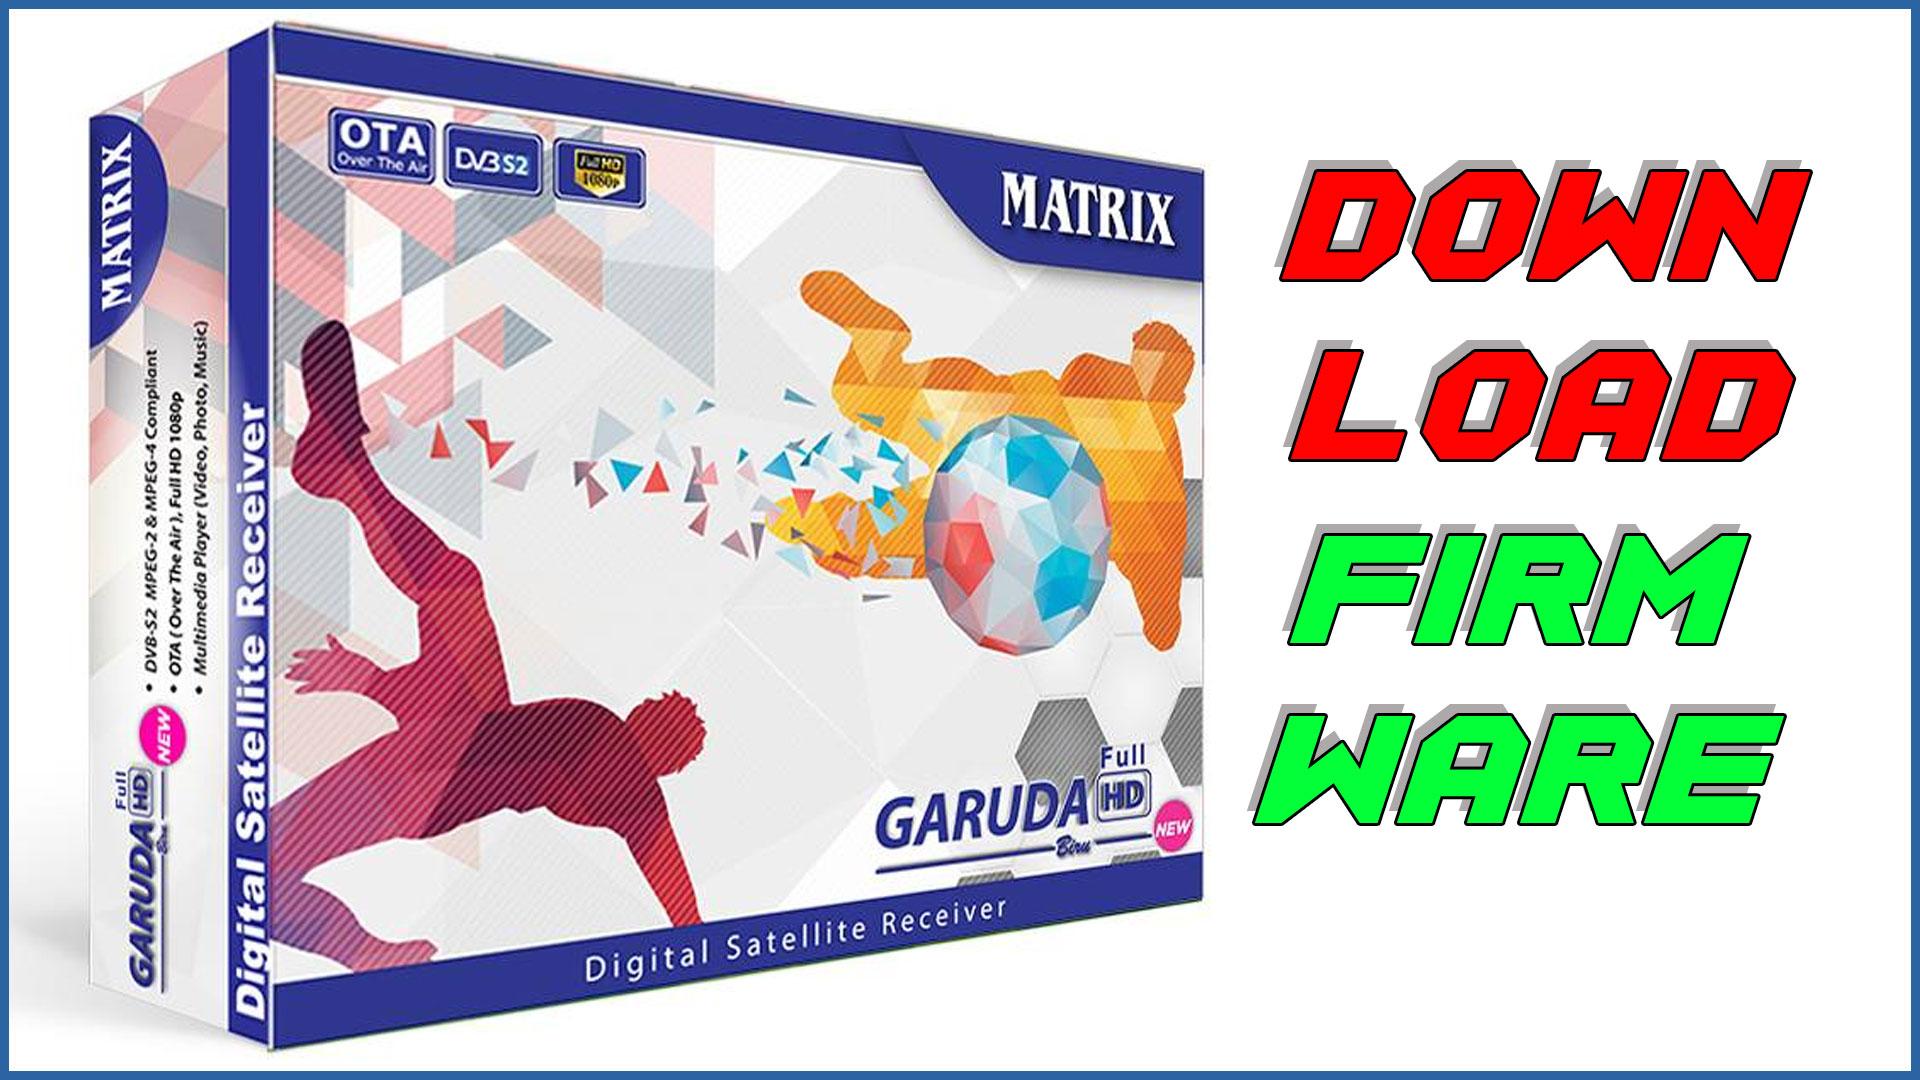 Download Firmware Matrix Garuda HD Biru SW Software Terbaru